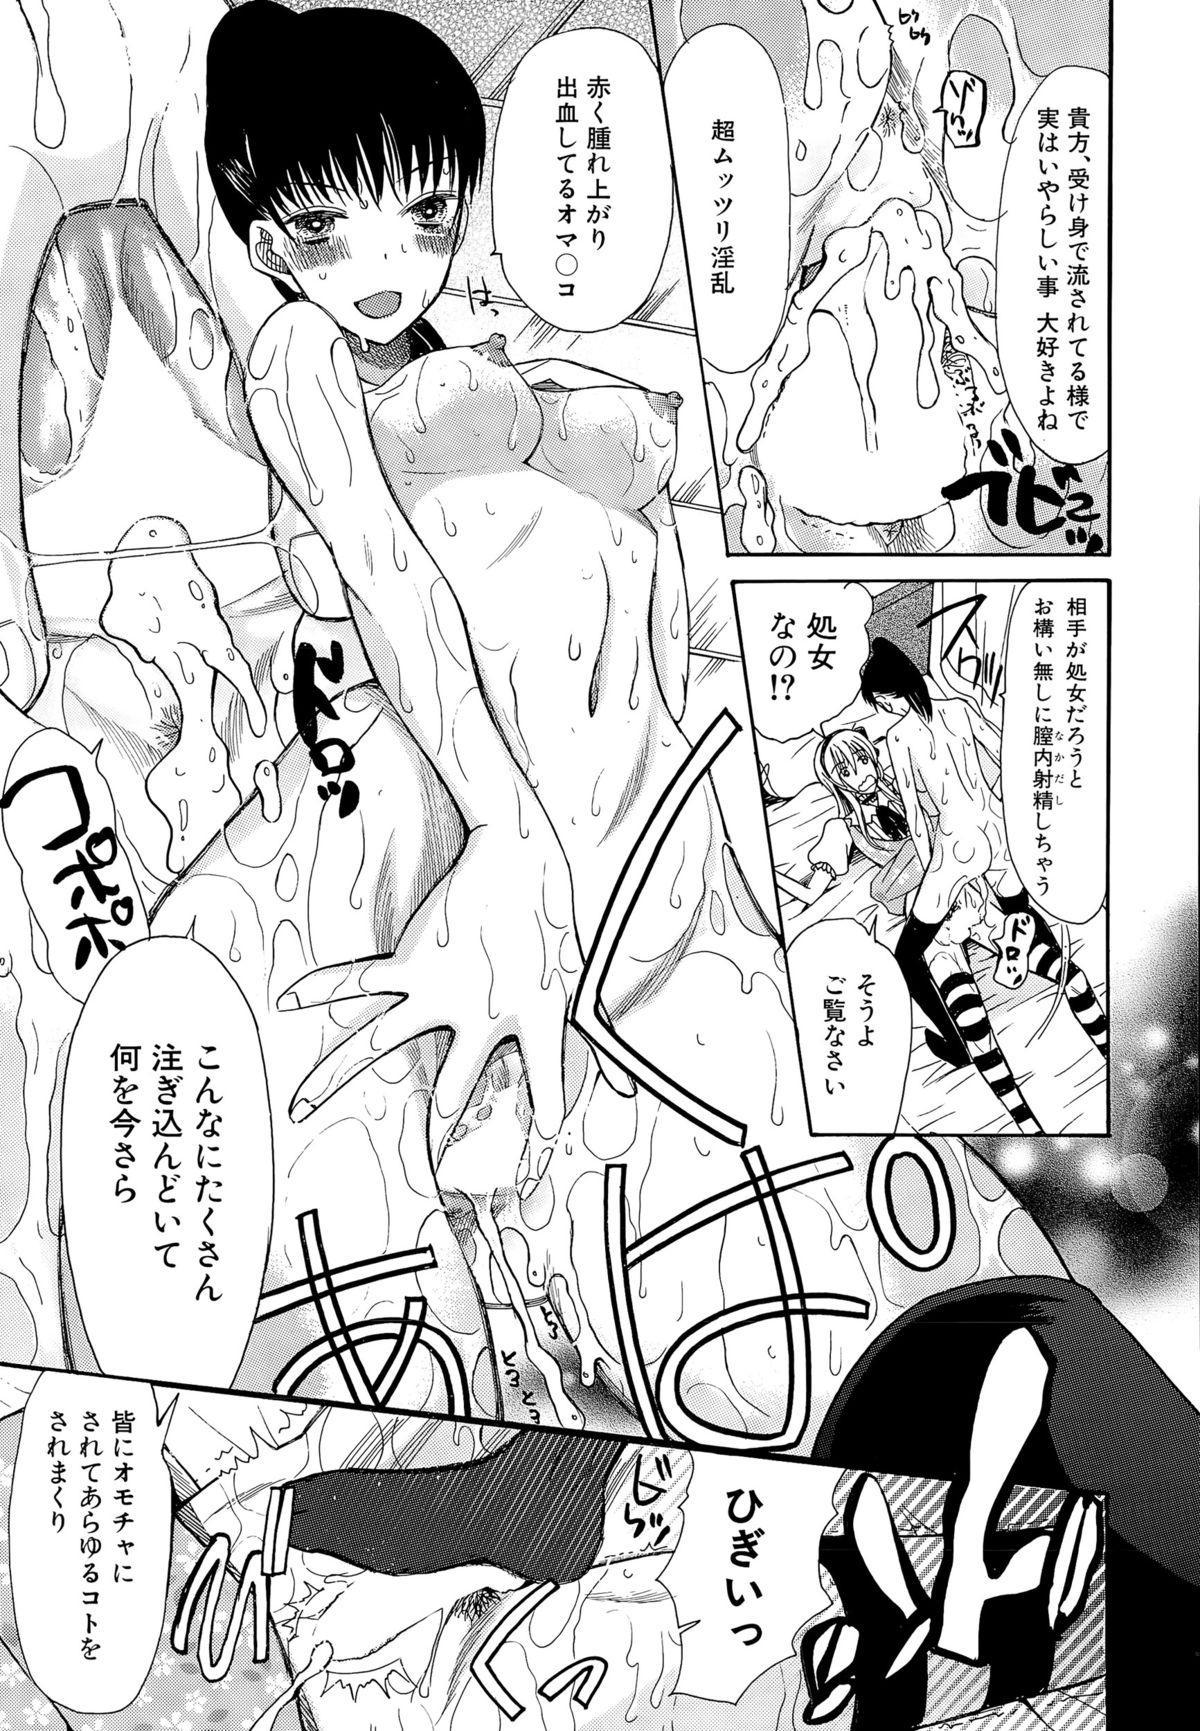 Kawaiku Natte Omocha ni Natte 138